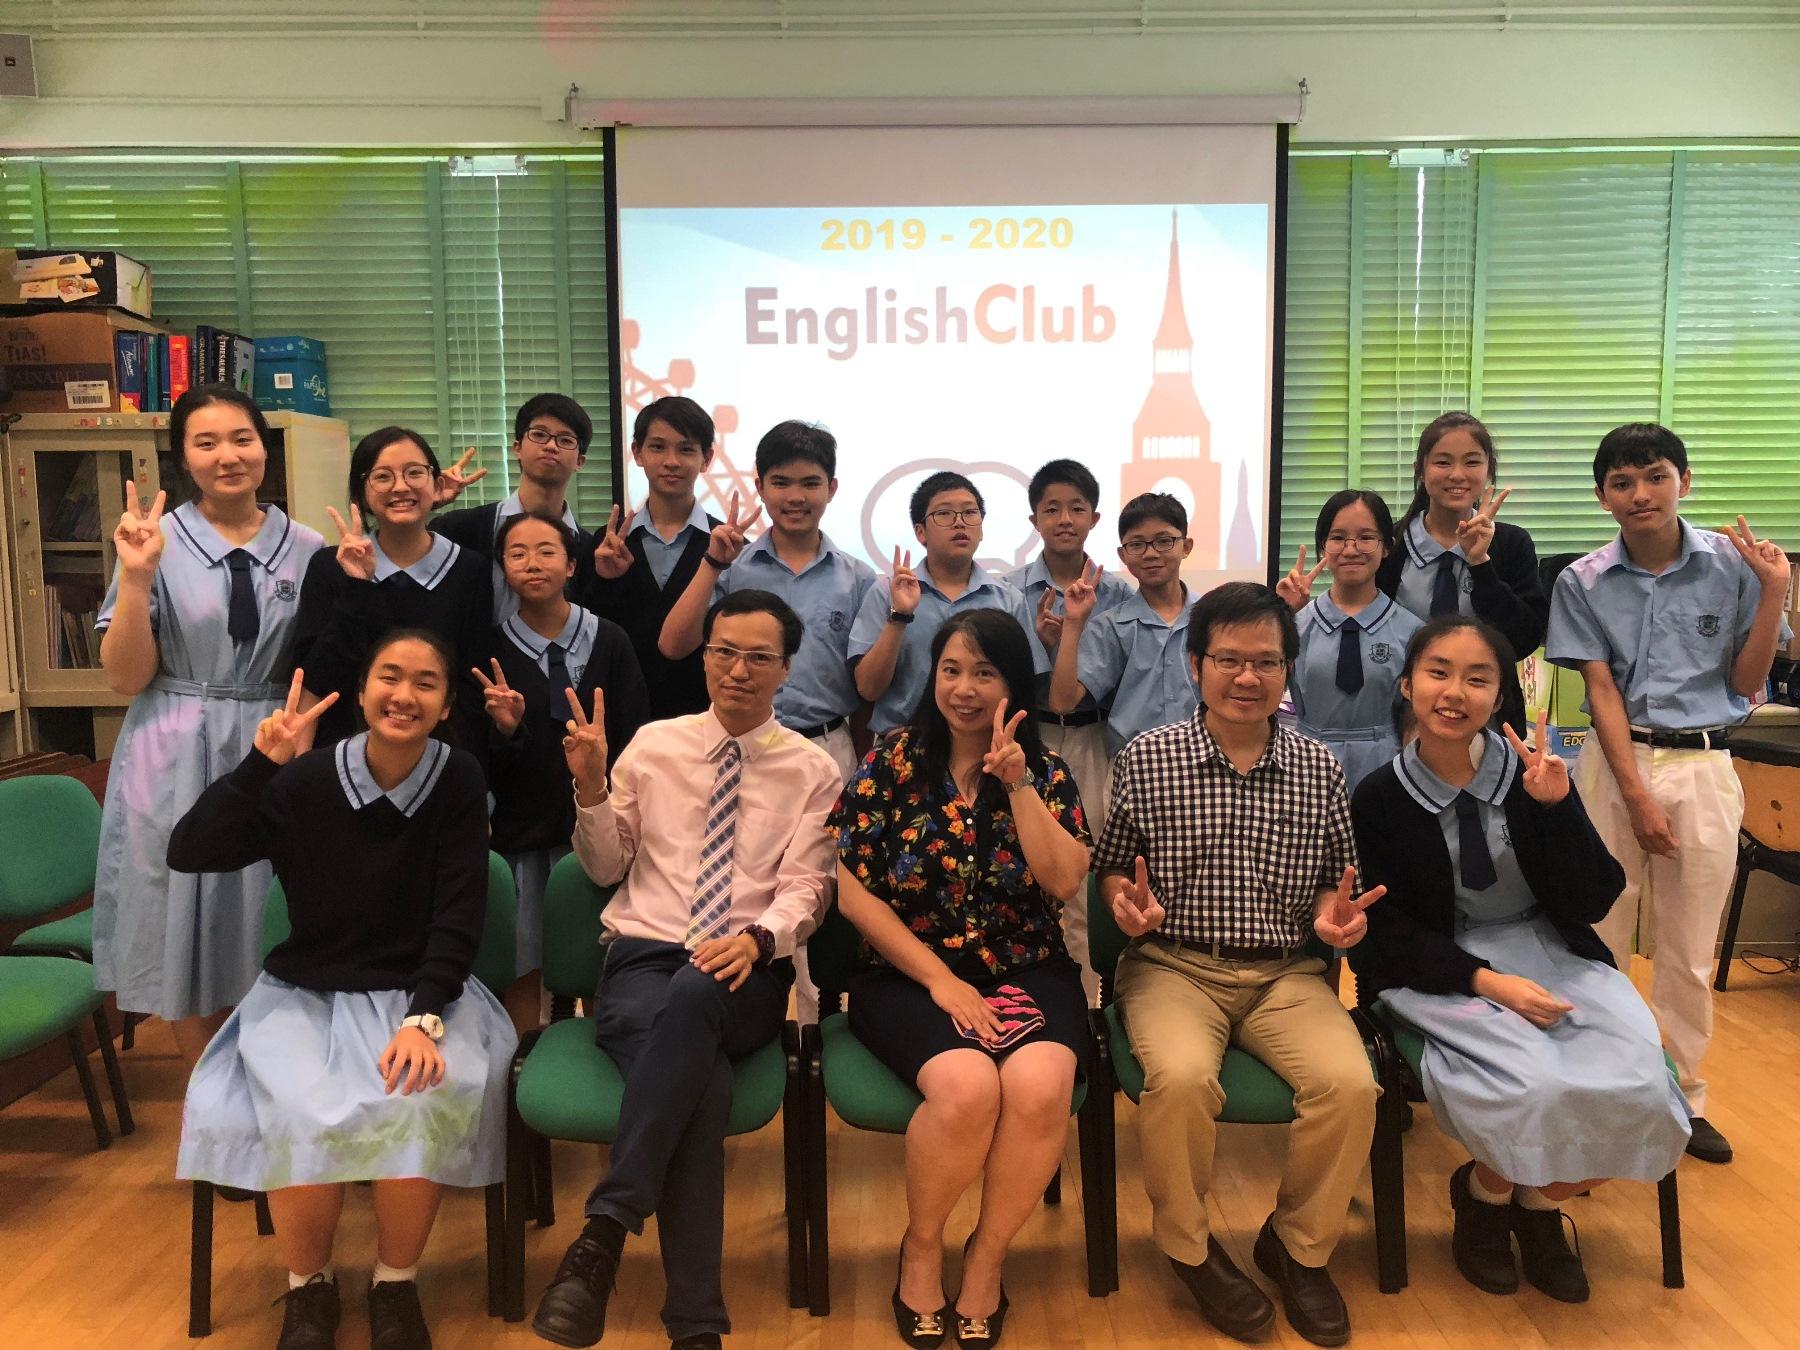 http://npc.edu.hk/sites/default/files/img_5169_2.jpg